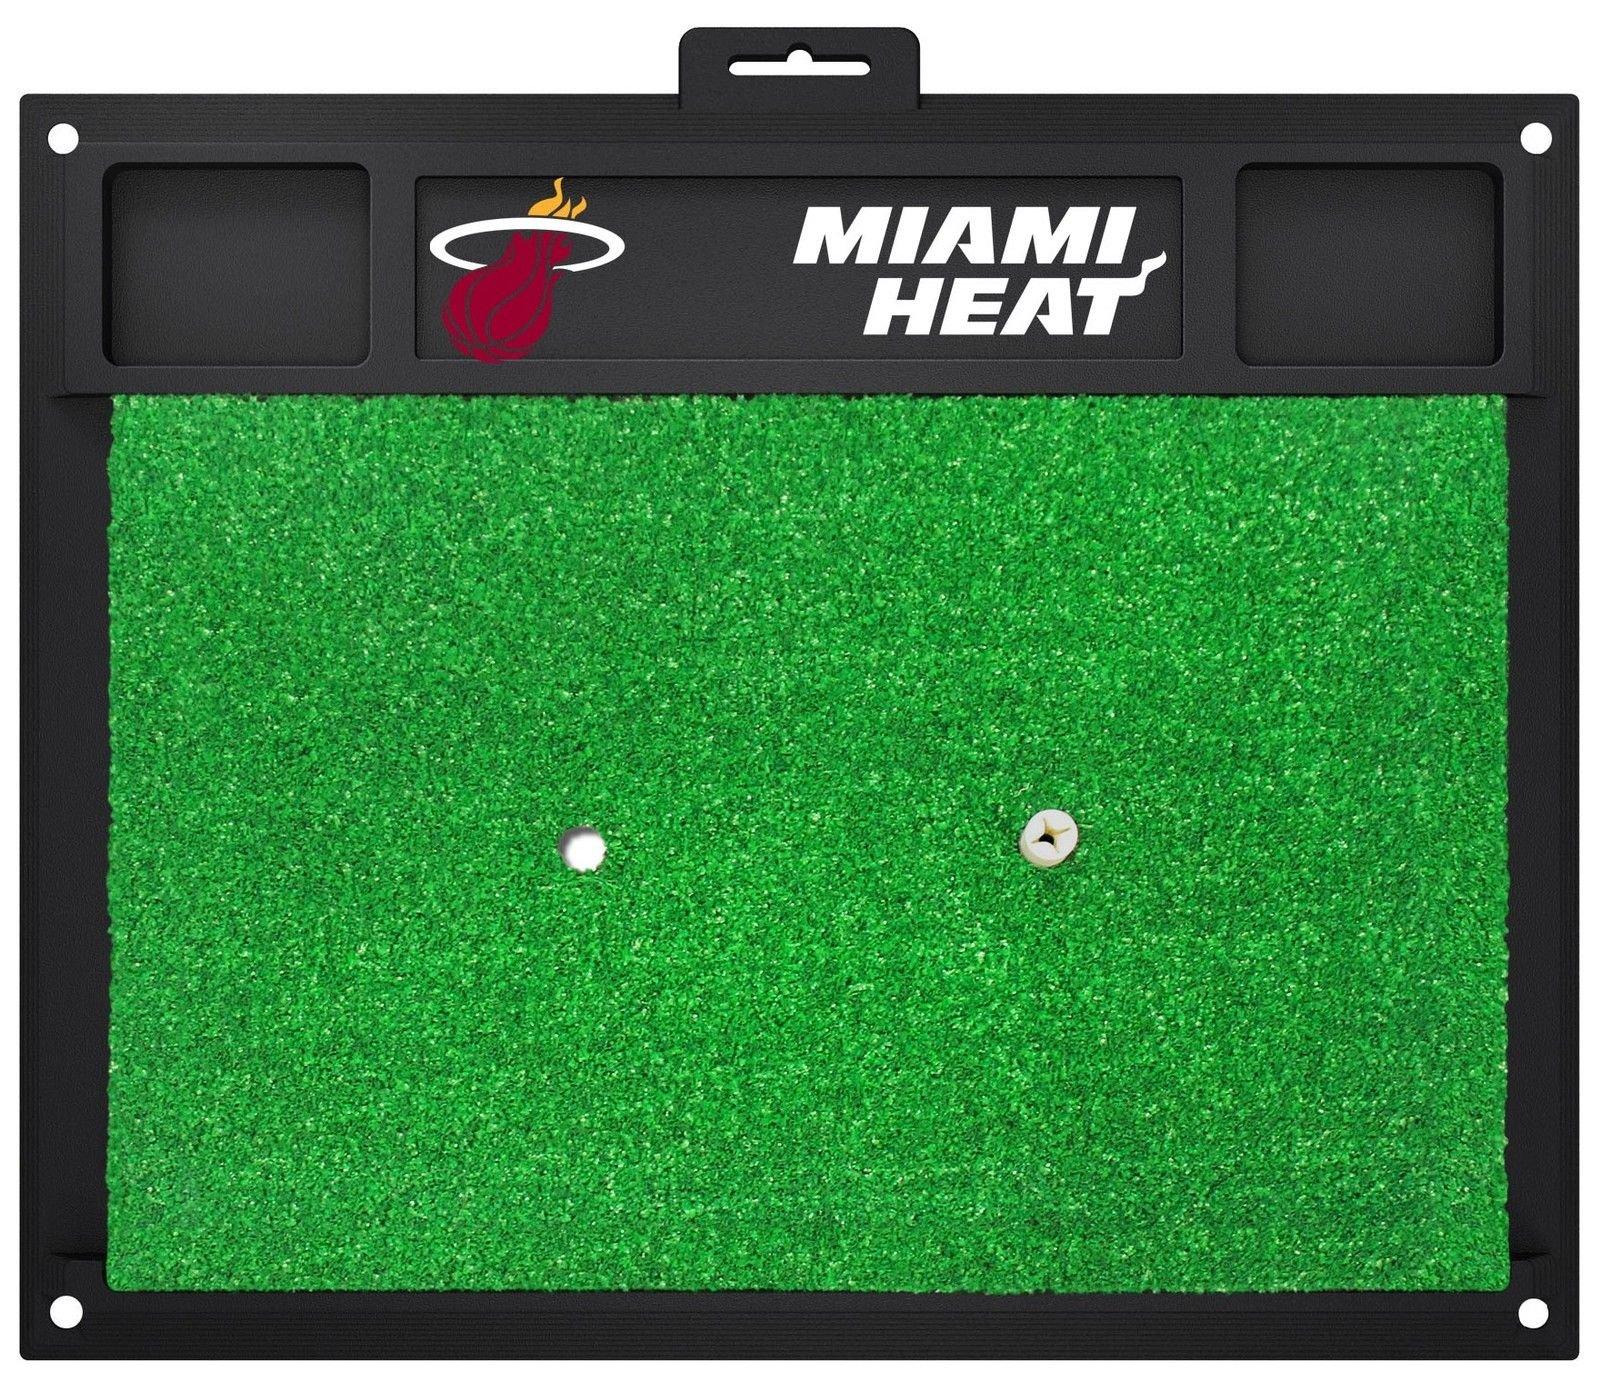 Fanmats NBA Miami Heat Team Logo 20 X 17 Inch Golf Hitting Mat Heavy Duty